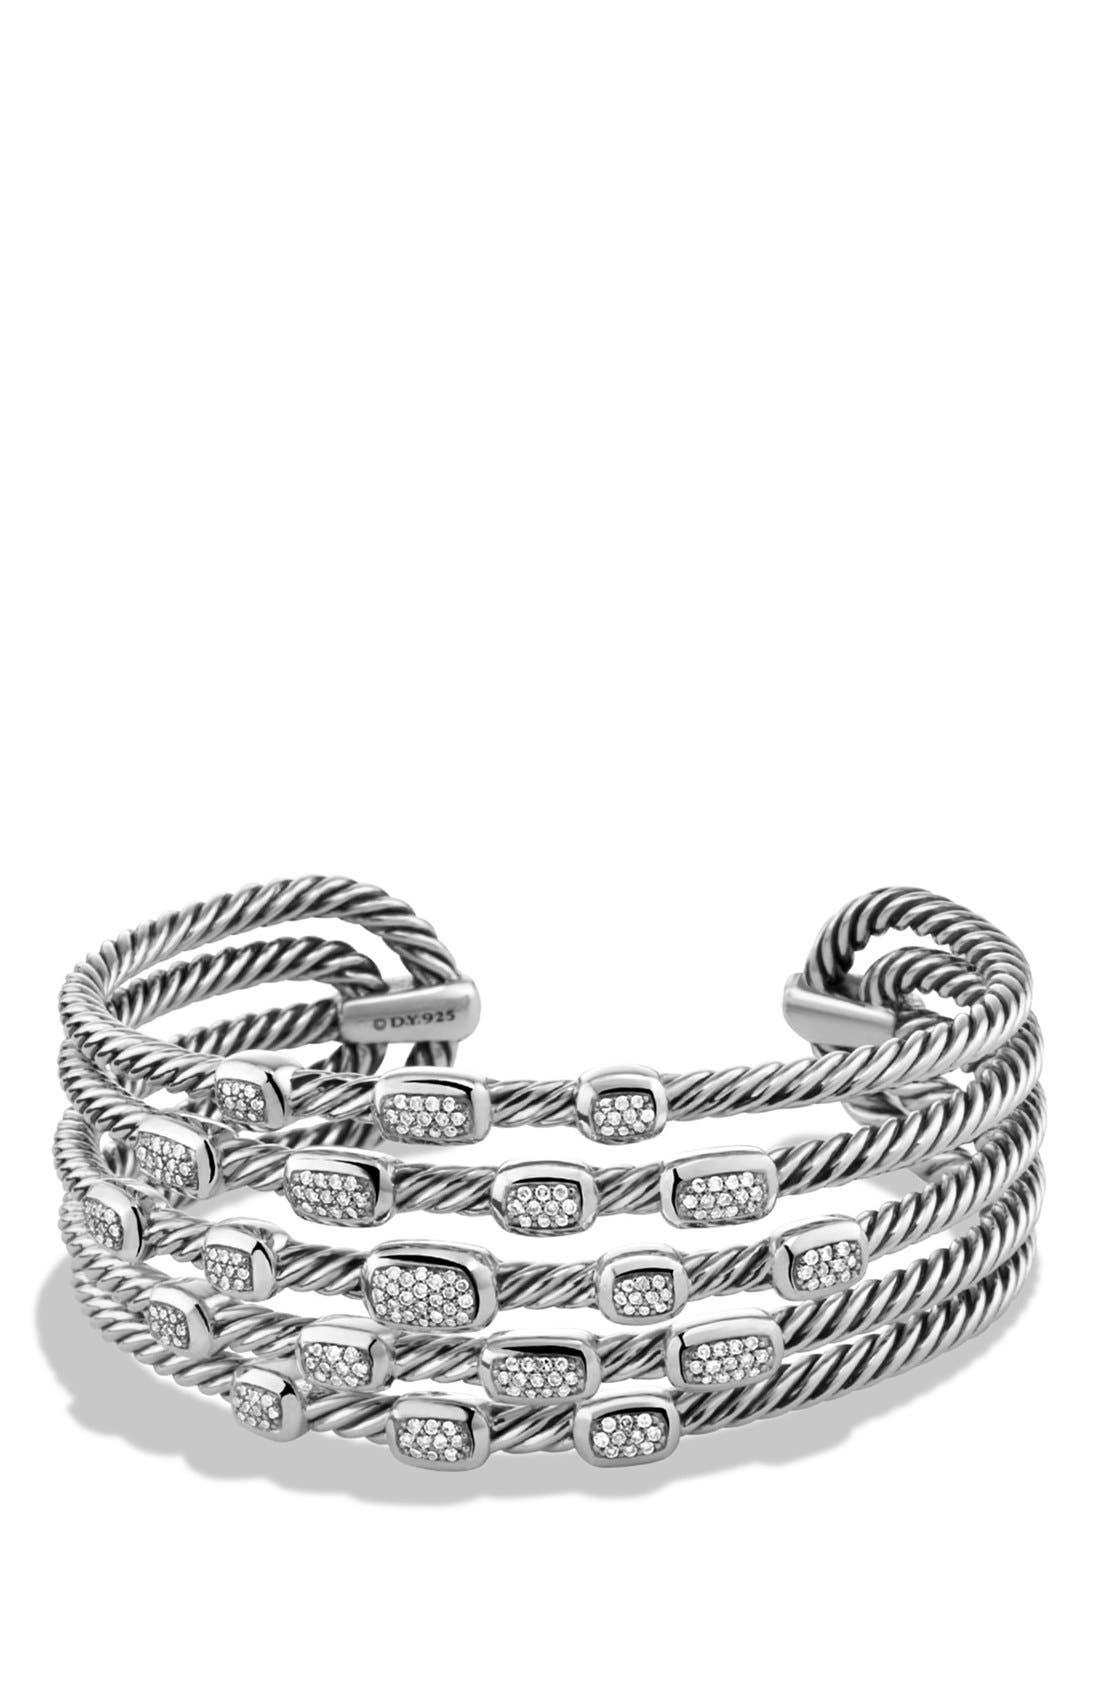 'Confetti' Wide Cuff Bracelet with Diamonds,                         Main,                         color, Diamond